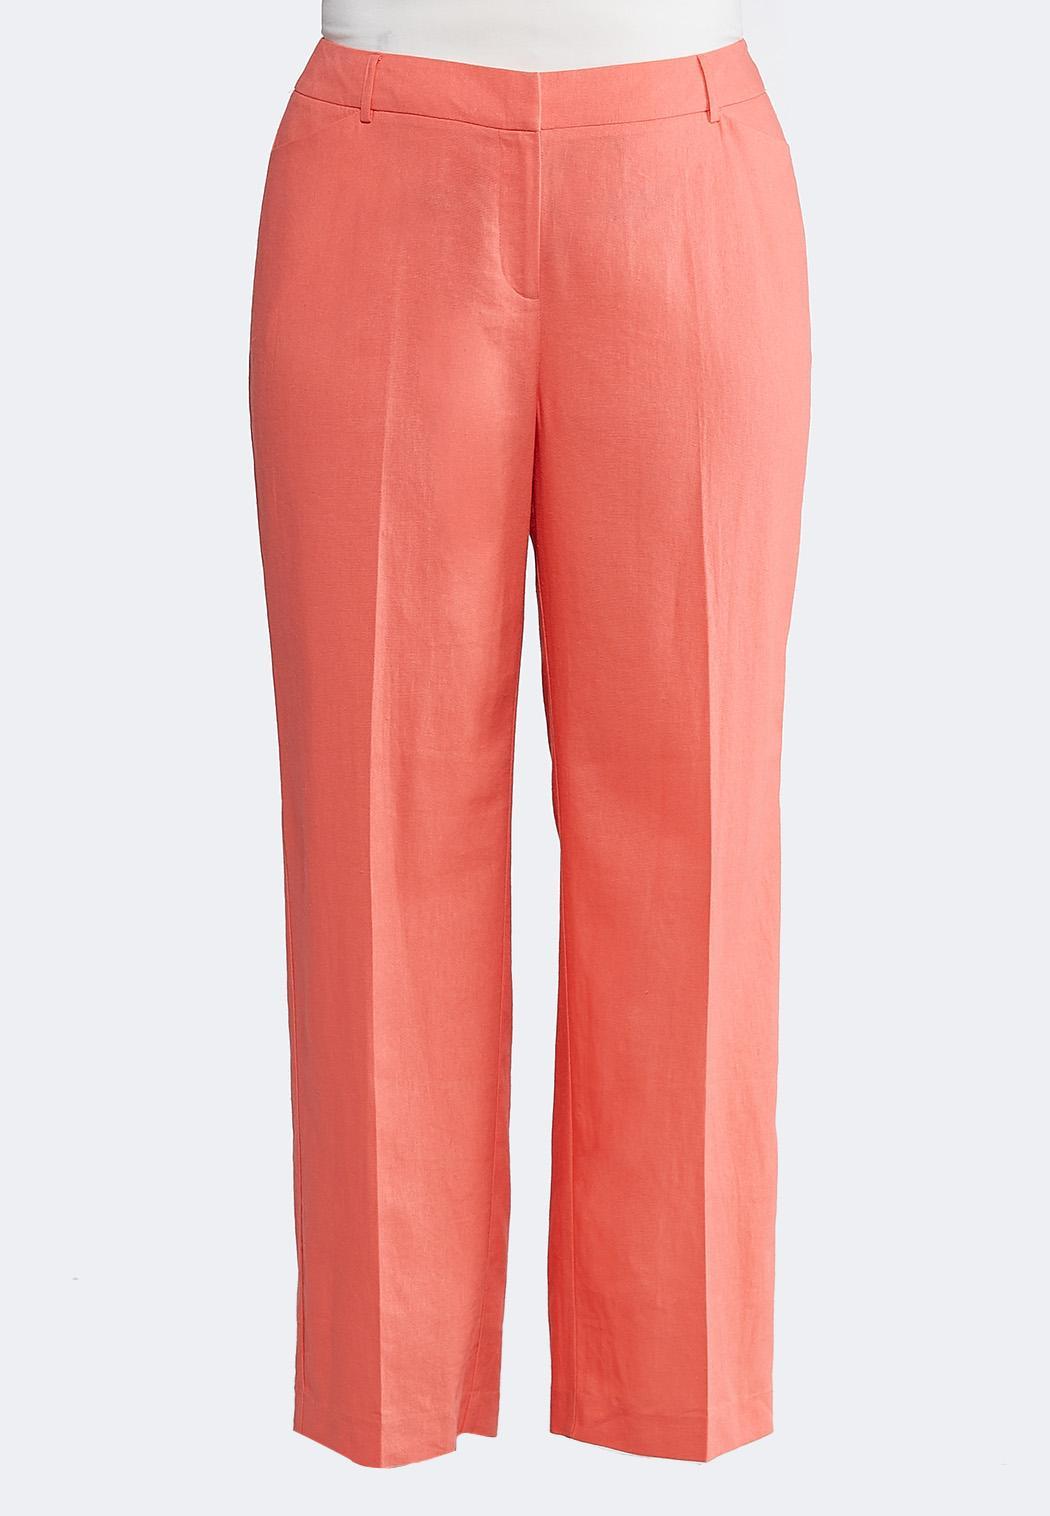 dfab357a3e Plus Size Linen Trouser Pants Wide Leg Cato Fashions